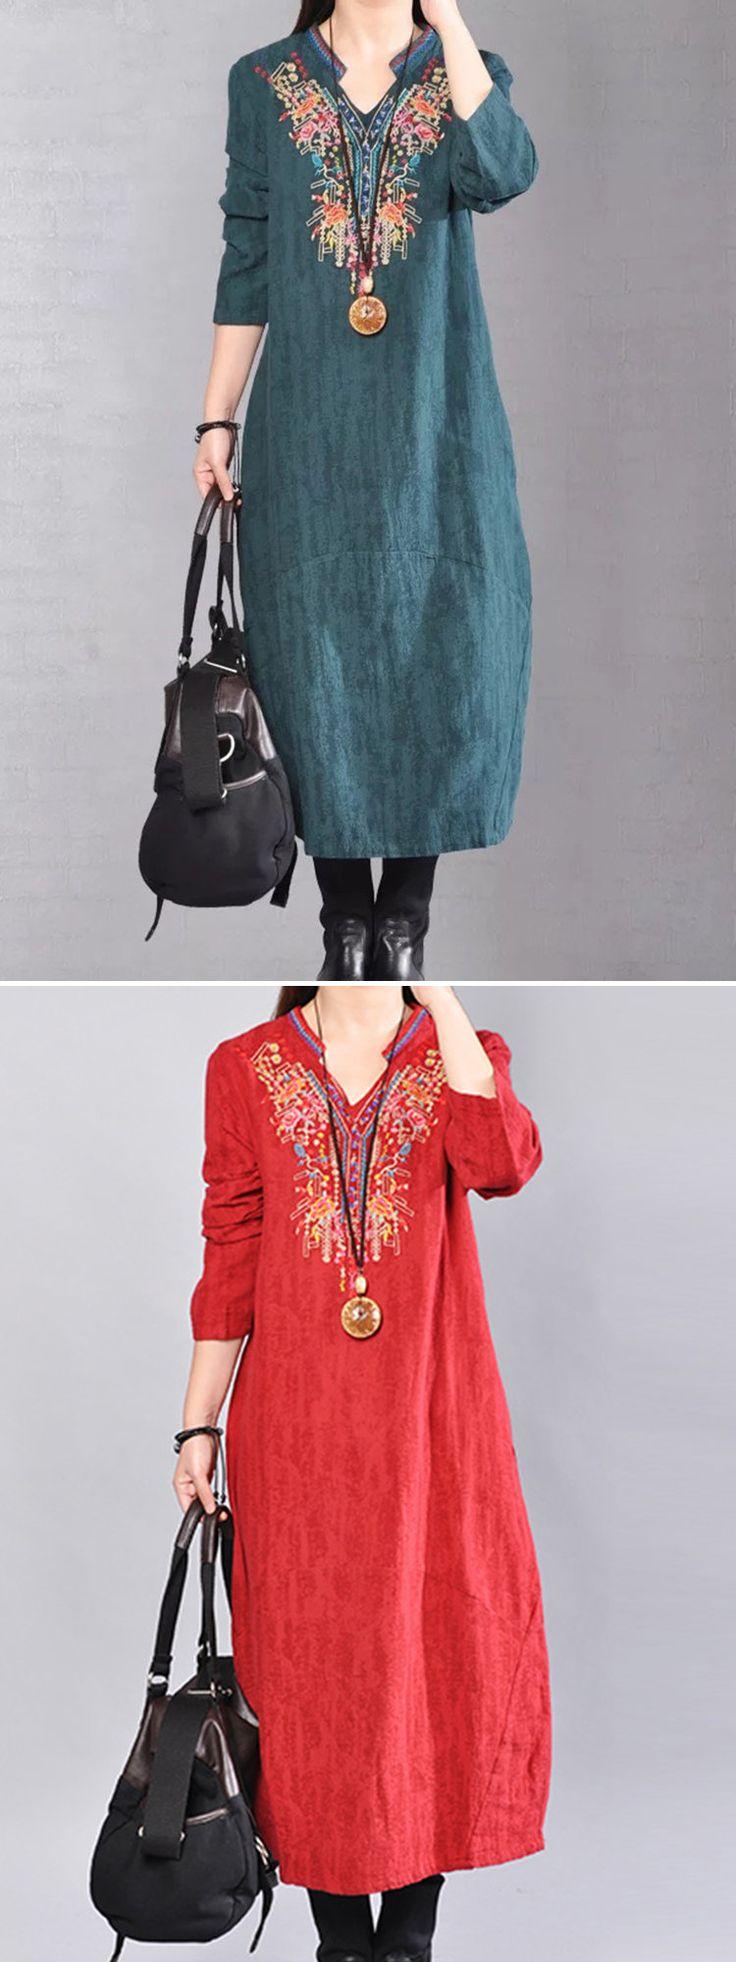 US$ 34.63 O-NEWE Vintage Women Embroidery Long Sleeve V-Neck Dress